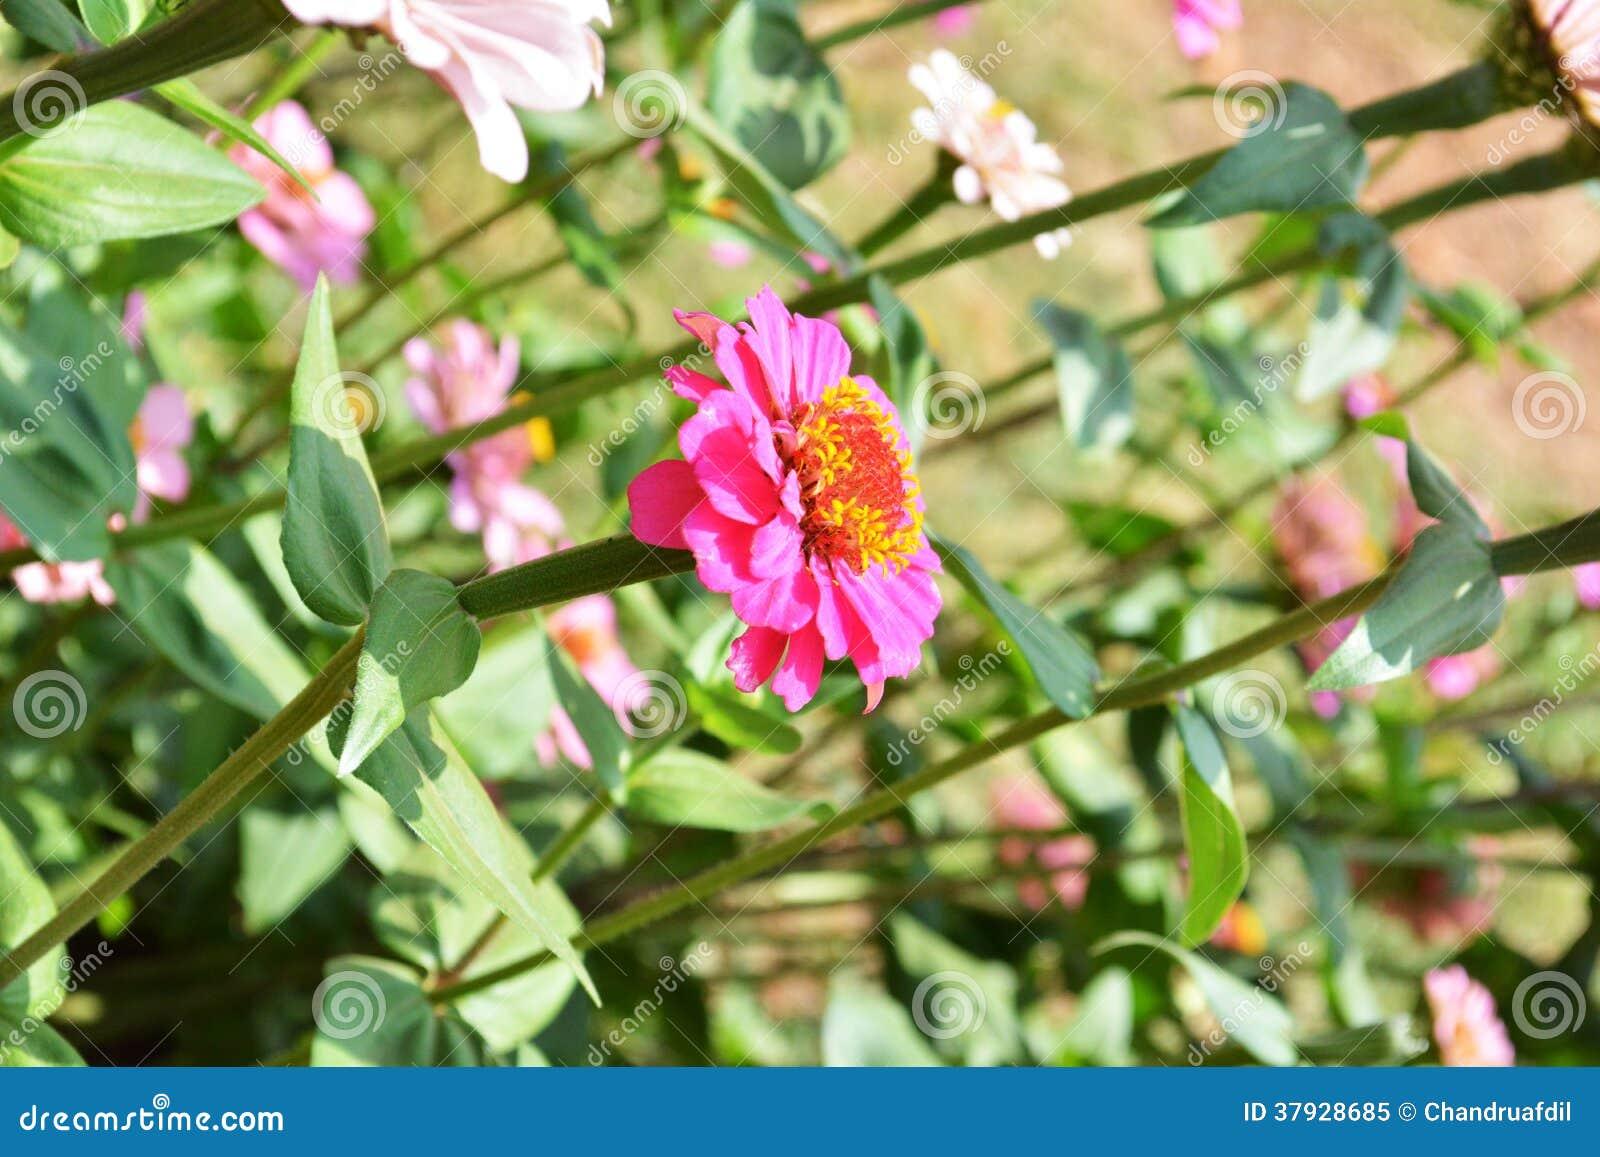 Zinnia flower1